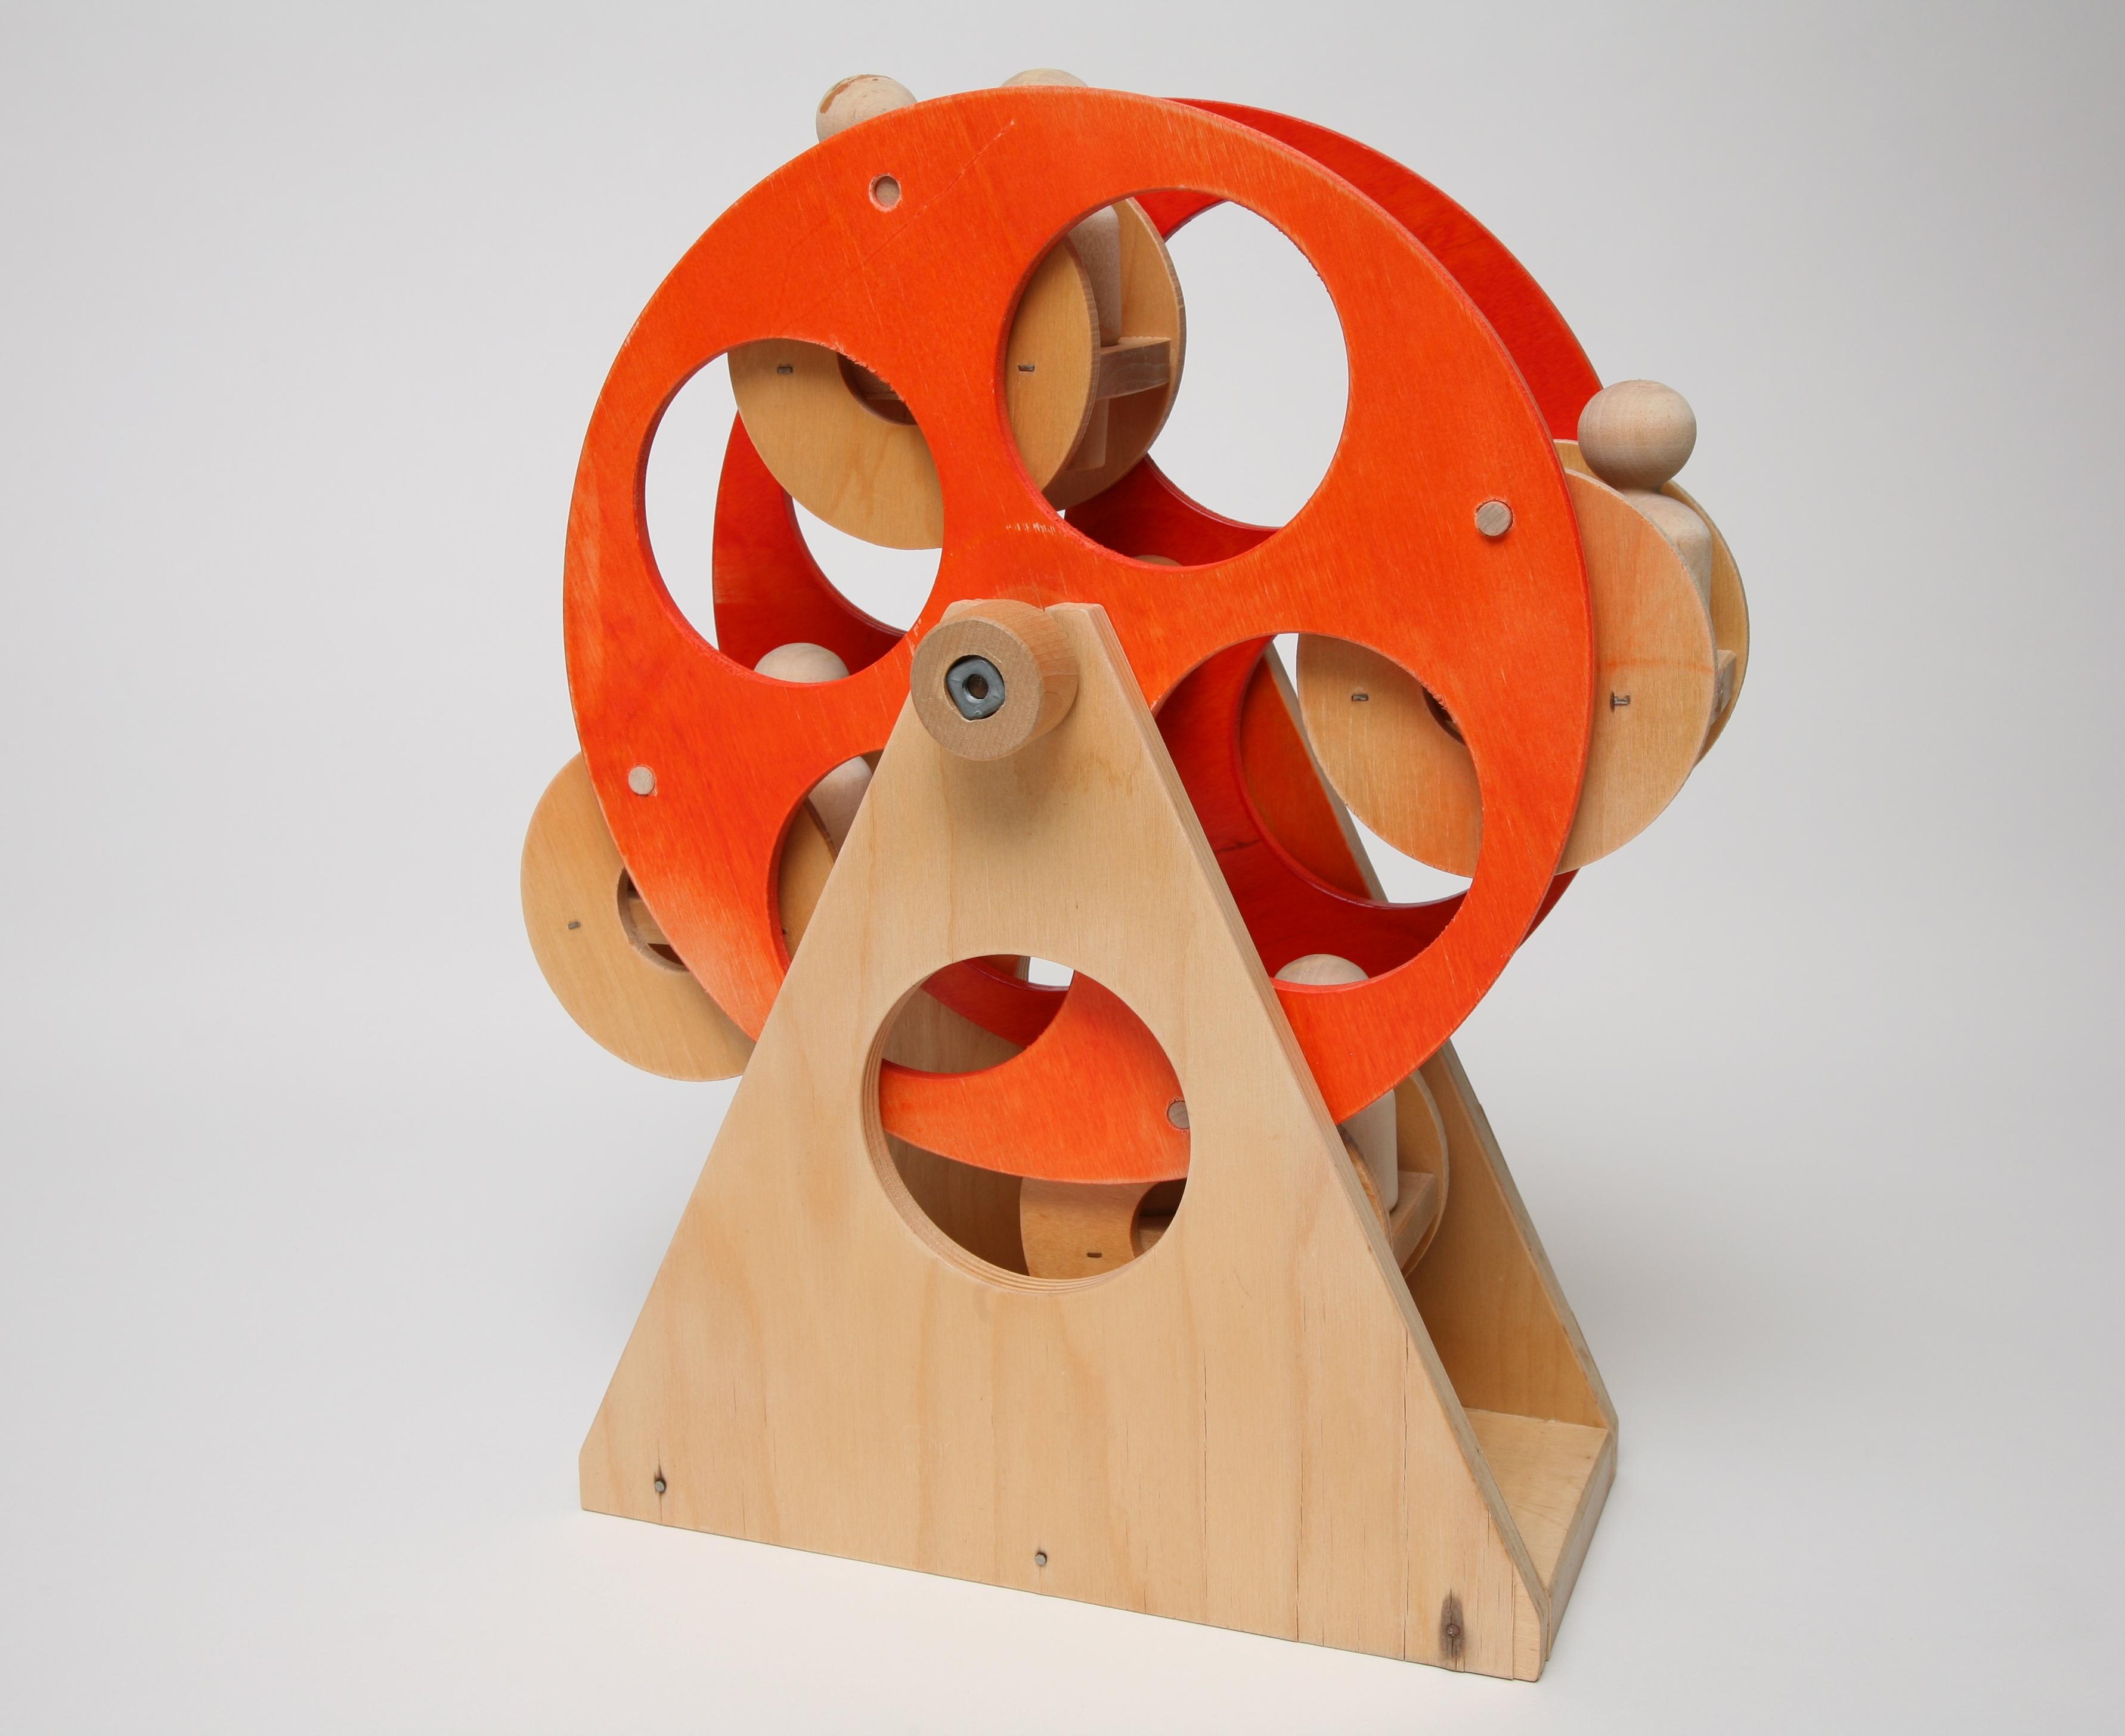 File:TCMI Creative Playthings Ferris Wheel.jpg - Wikimedia ...